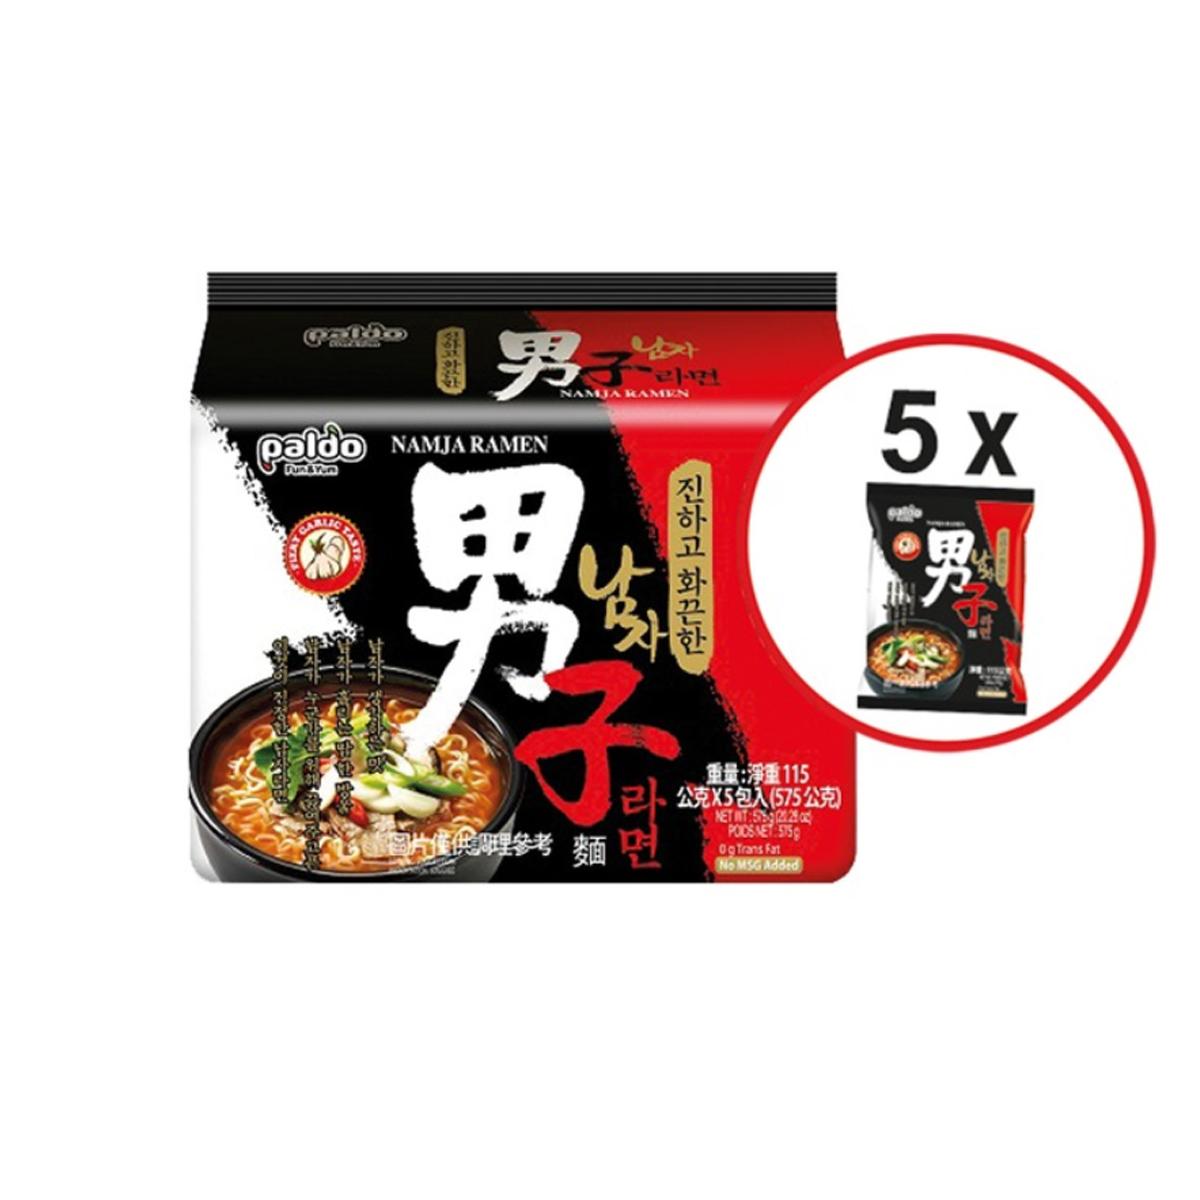 Kit de Lamen Coreano Namja Ramen Ramyun Picante Carne Vegetais Alho 100g - 5 Pacotes